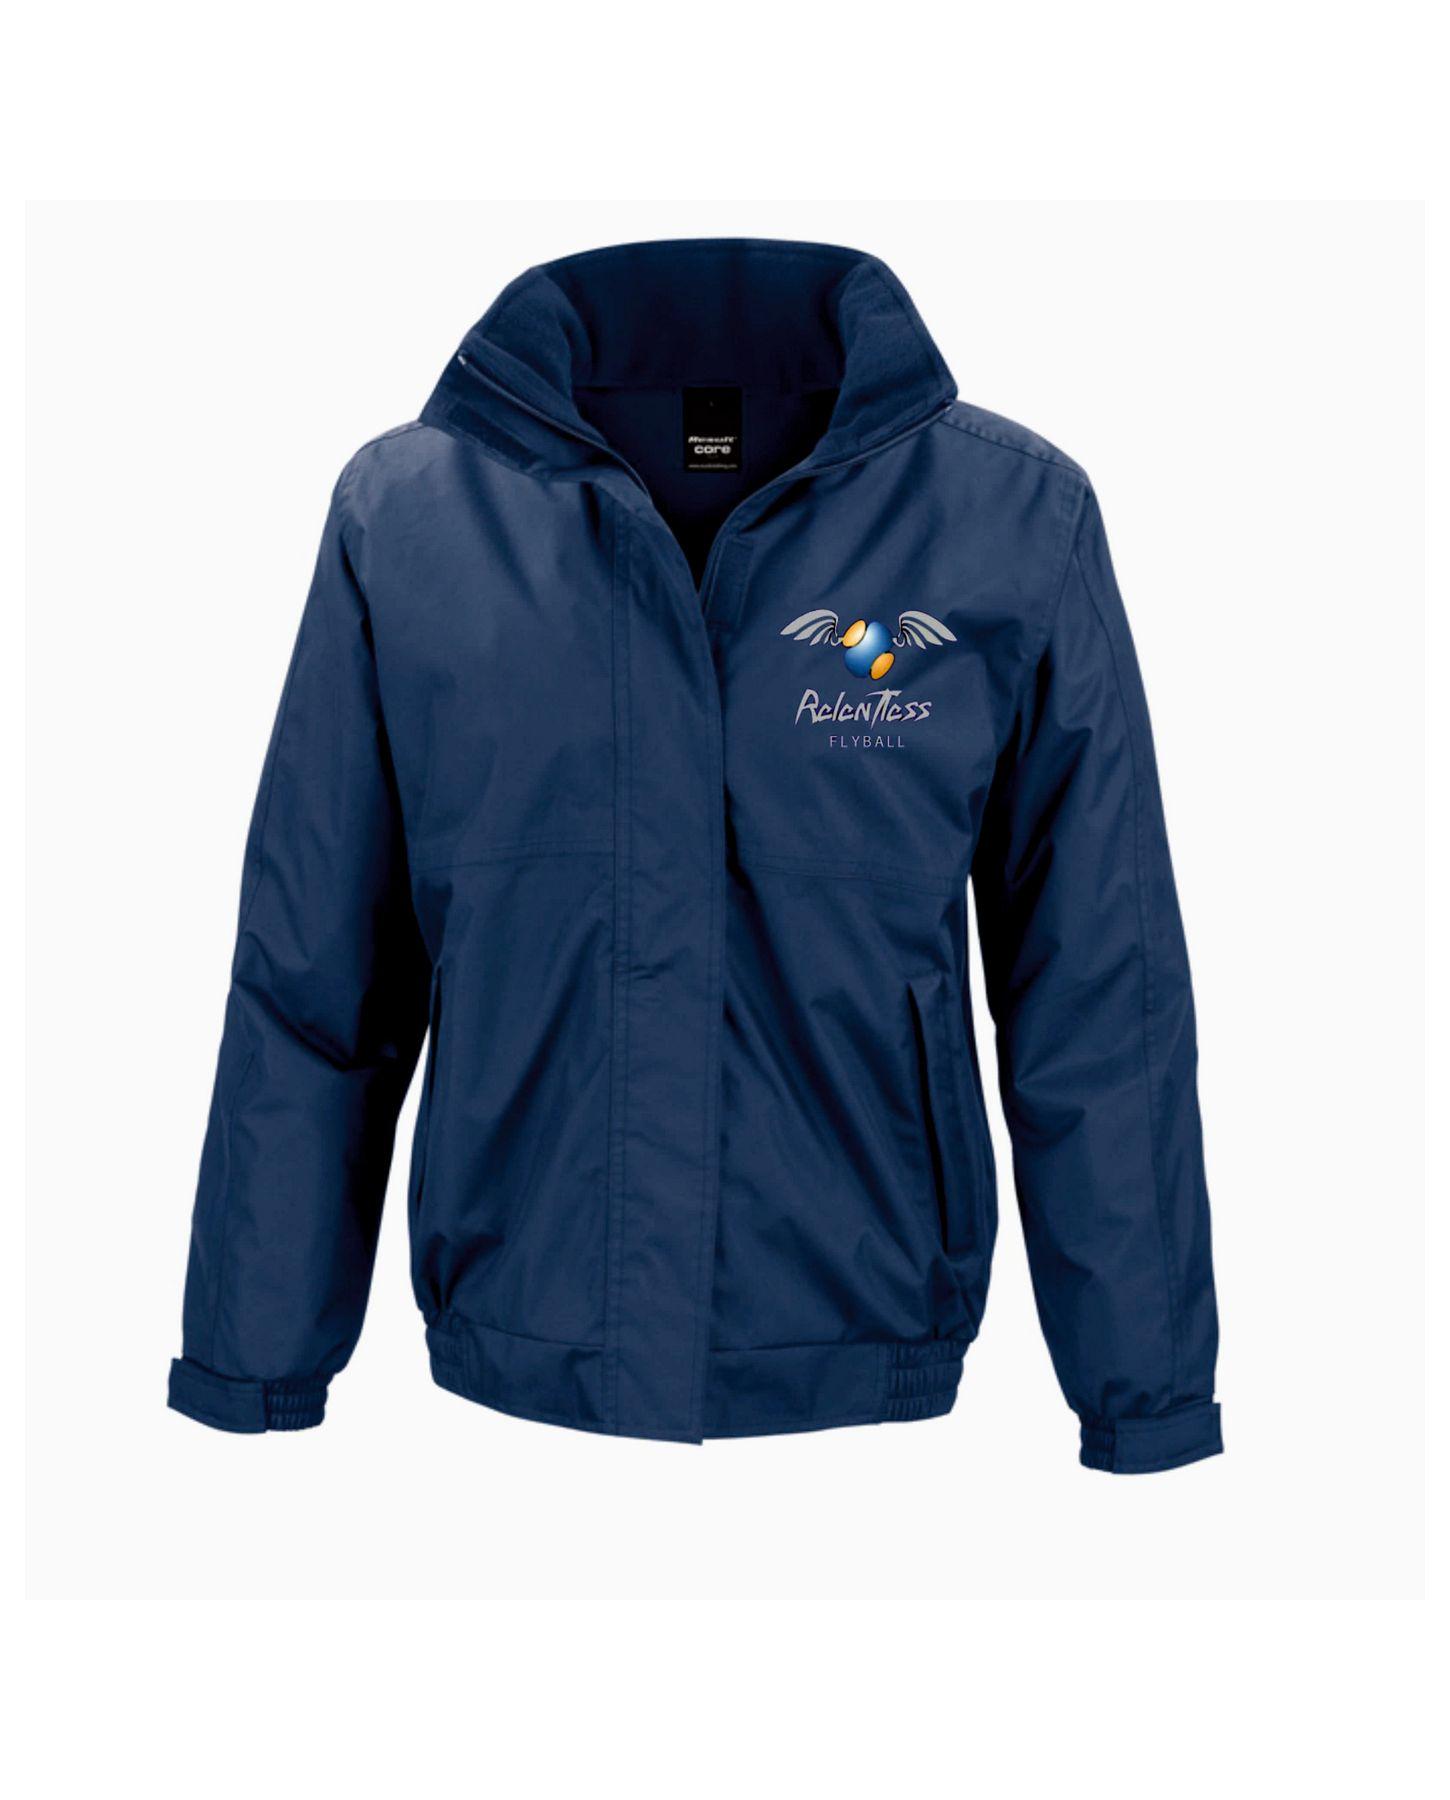 Relentless Flyball – Waterproof Jacket Ladyfit